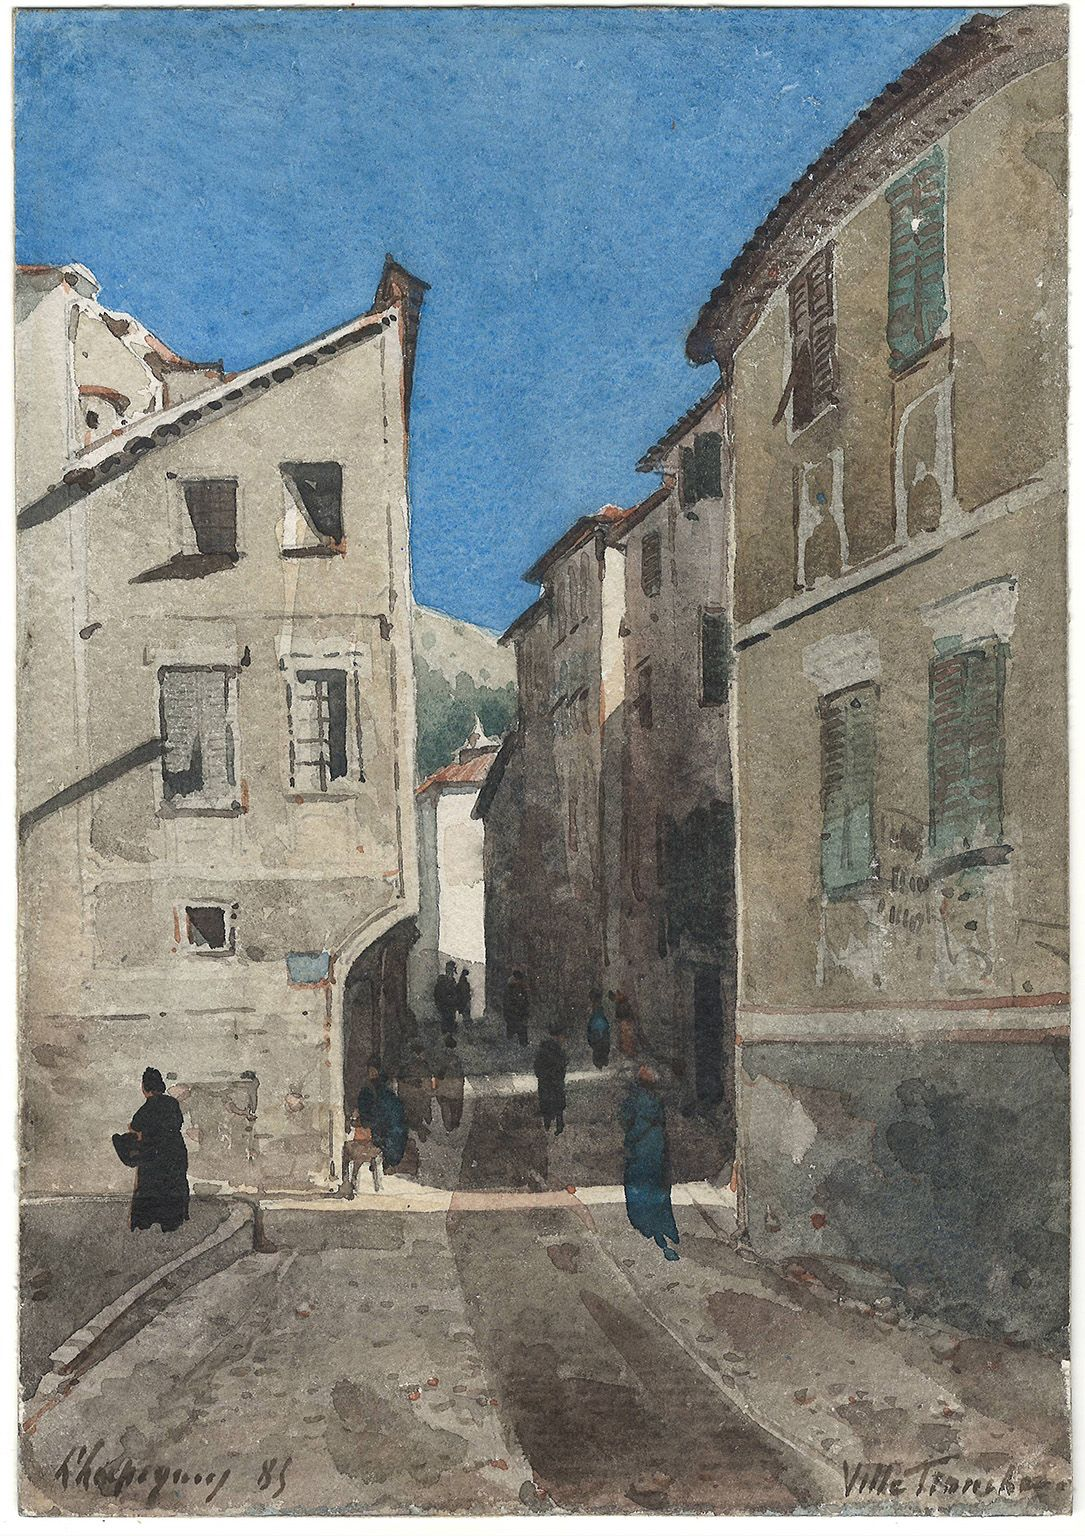 Henri Harpignies  La Rue, Villefranche, 1885  Watercolor on paper 10 1/4 x 7 inches